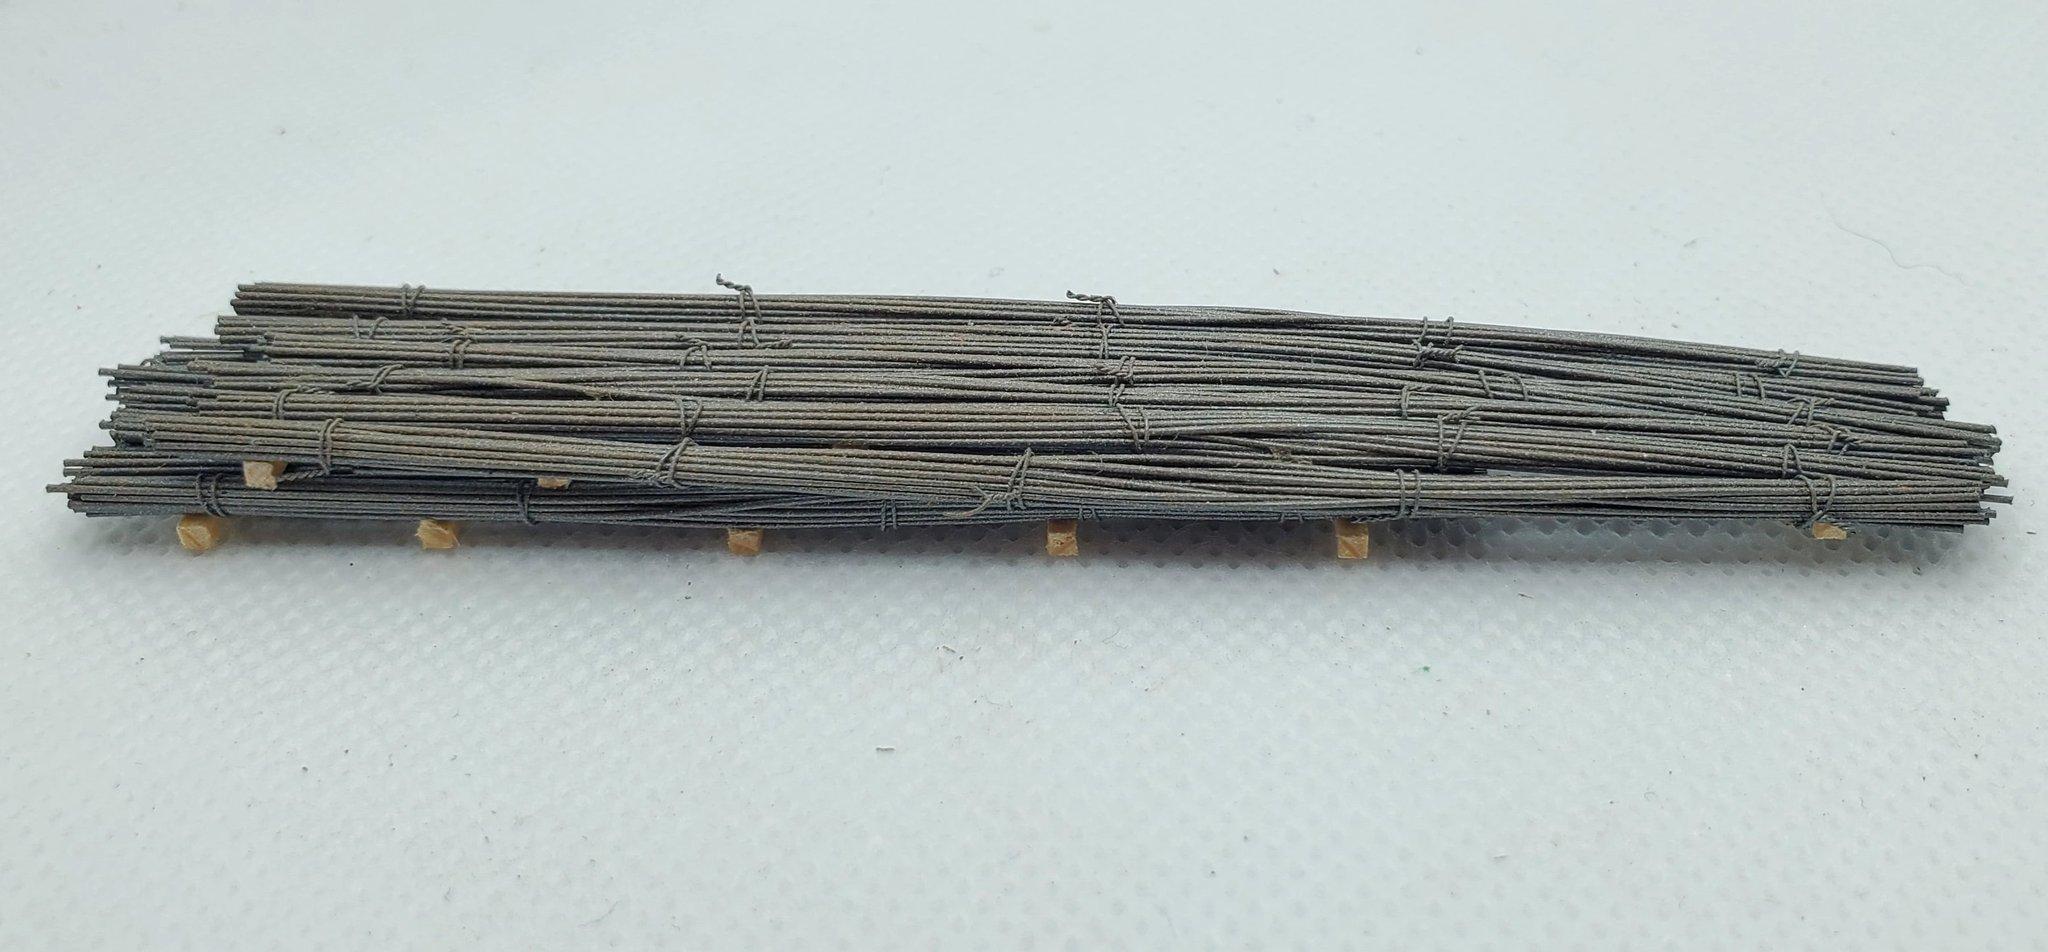 N Scale - CG Model Trains - 13411 - Railcar Loads - Painted/Unlettered - Bundled Rebar